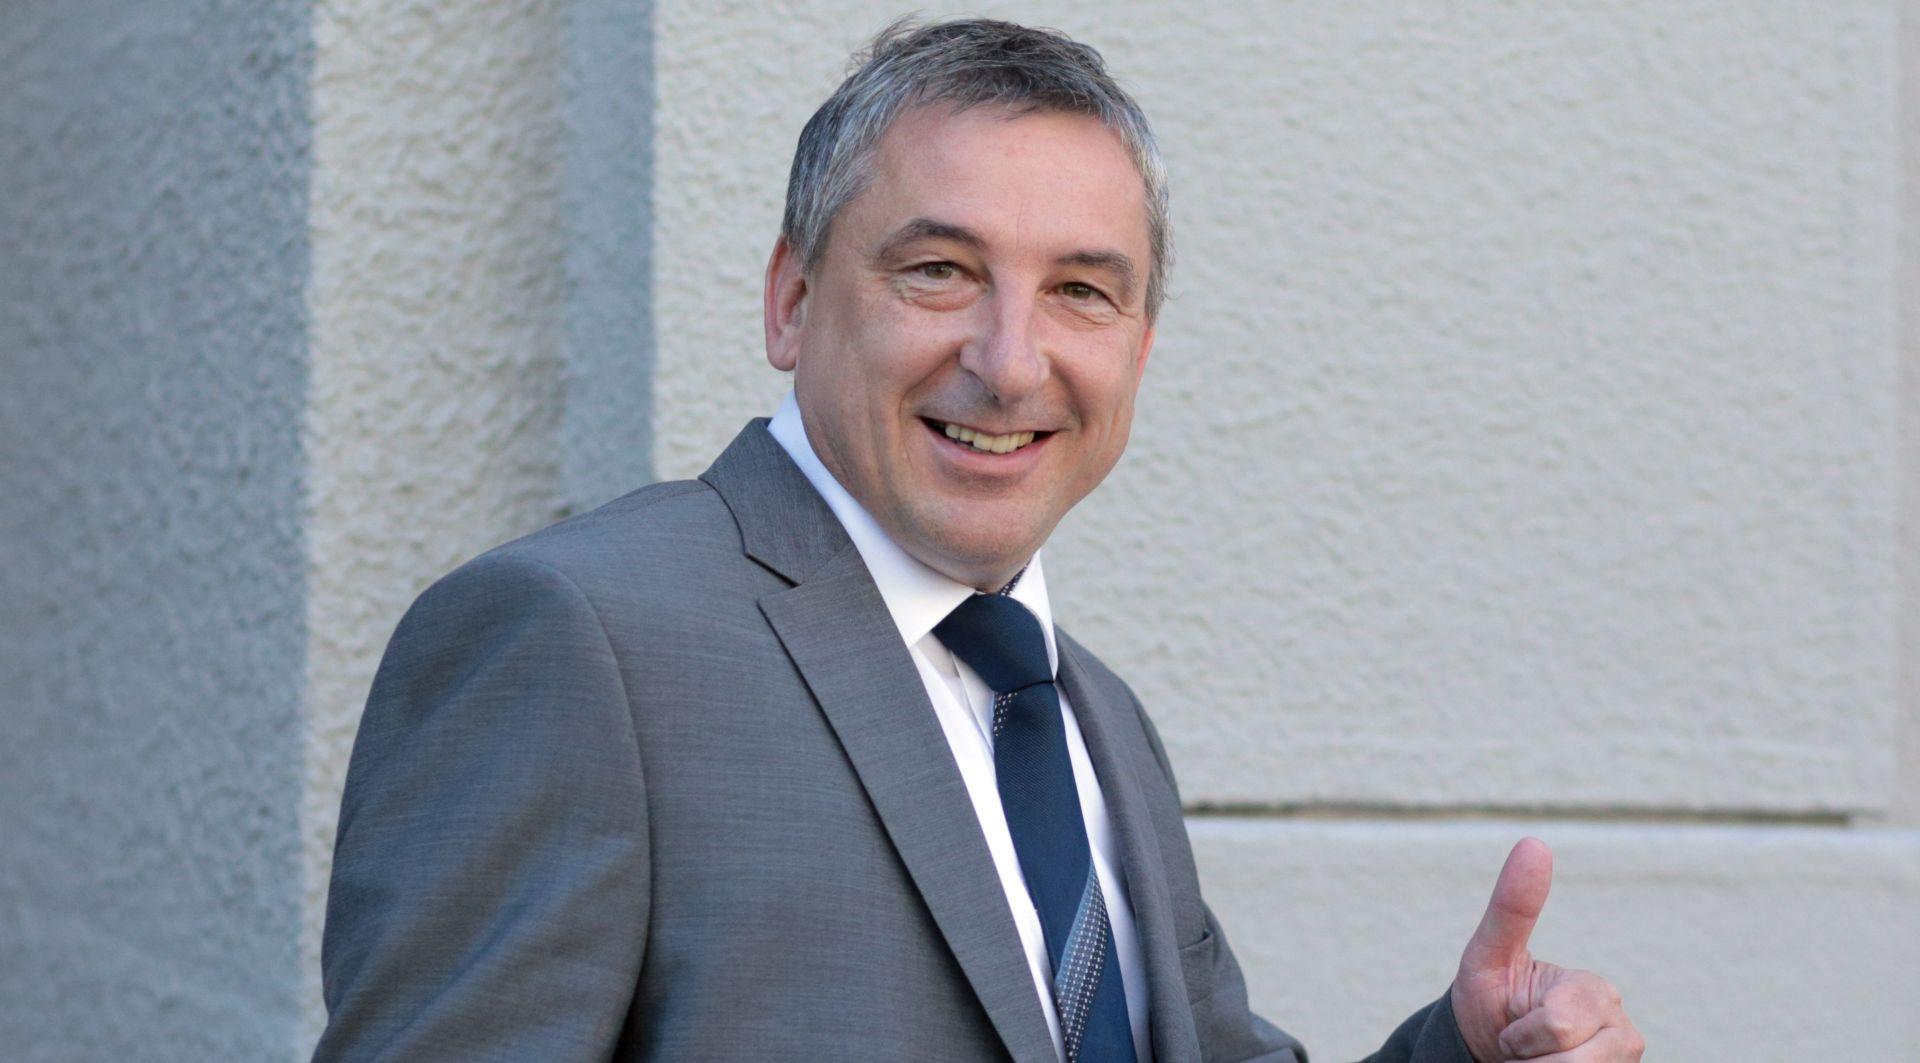 ČLANOVI HNS-A DOBILI PISMO U sedam točaka objašnjena odluka o koaliciji s HDZ-om